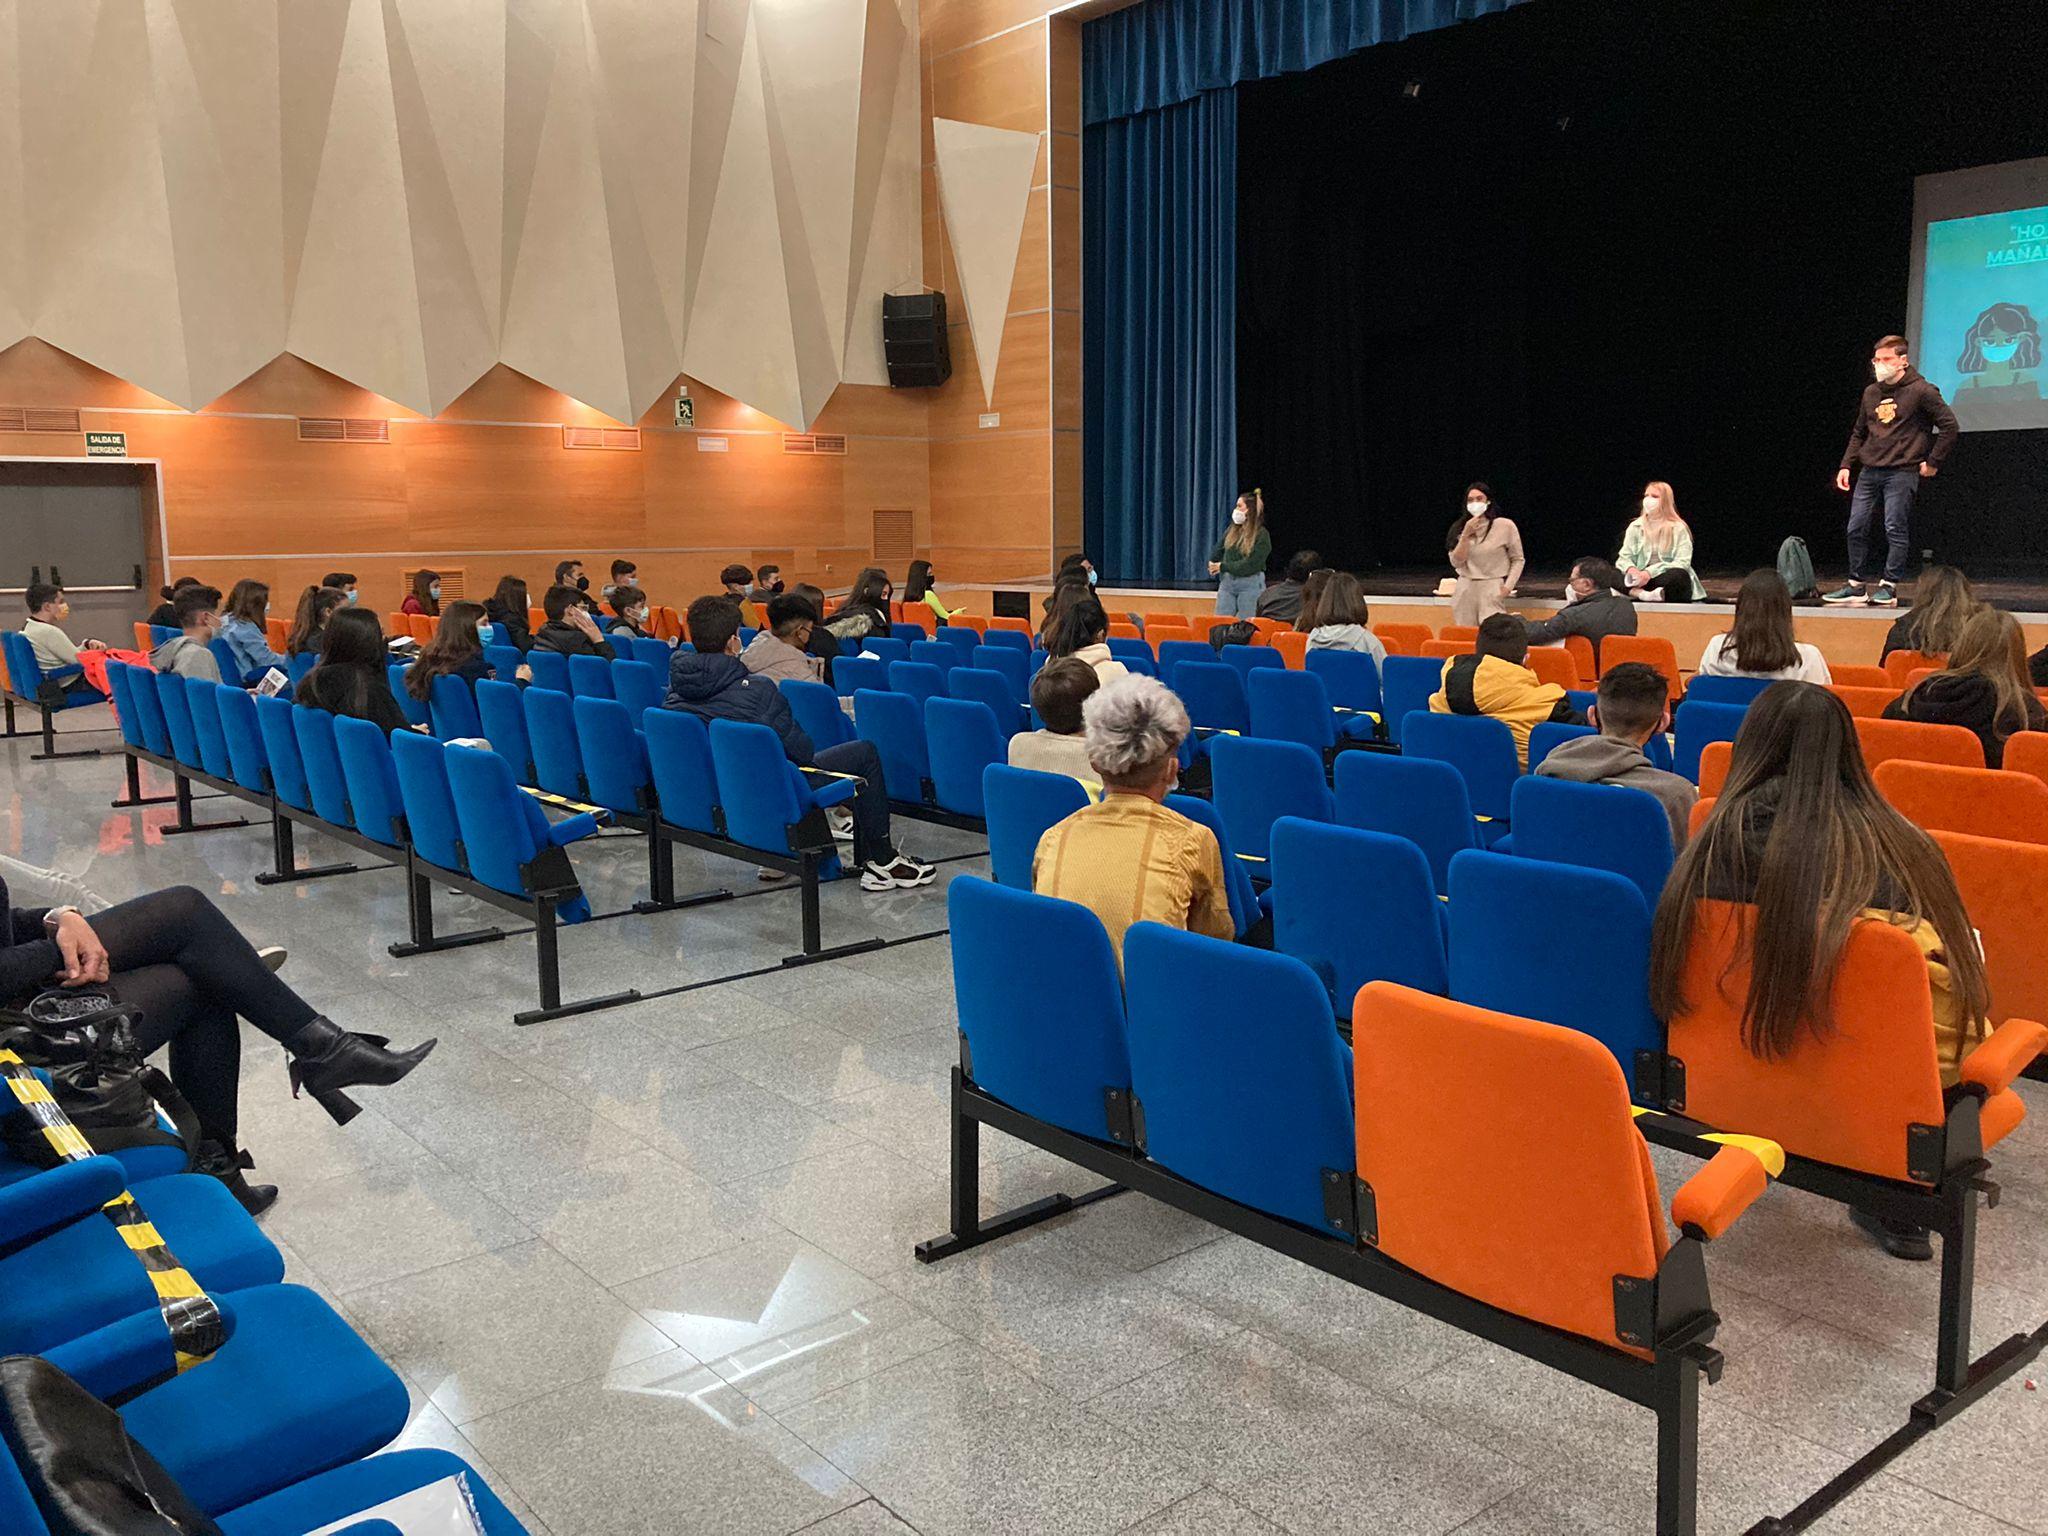 Churriana de la Vega organiza talleres anti bullying en los centros educativos